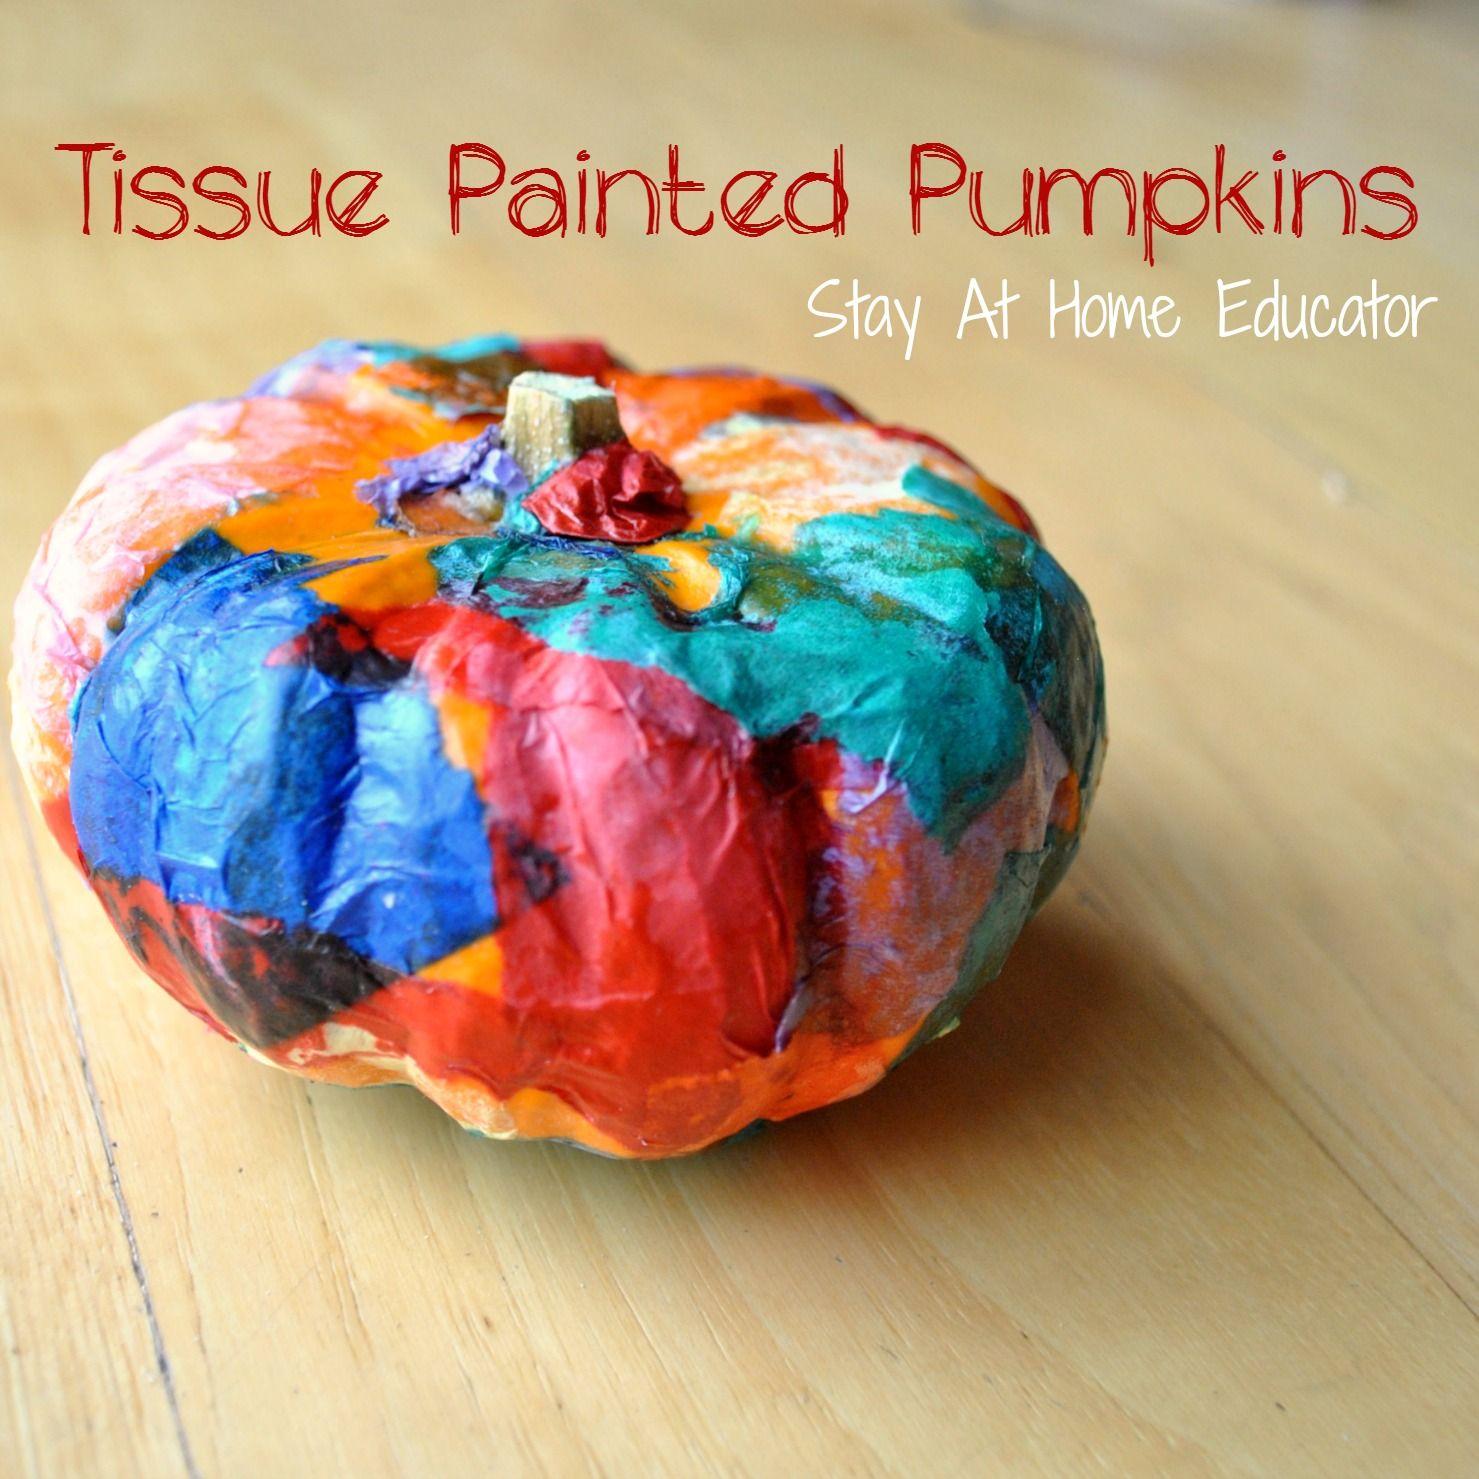 Tissue Painted Pumpkins